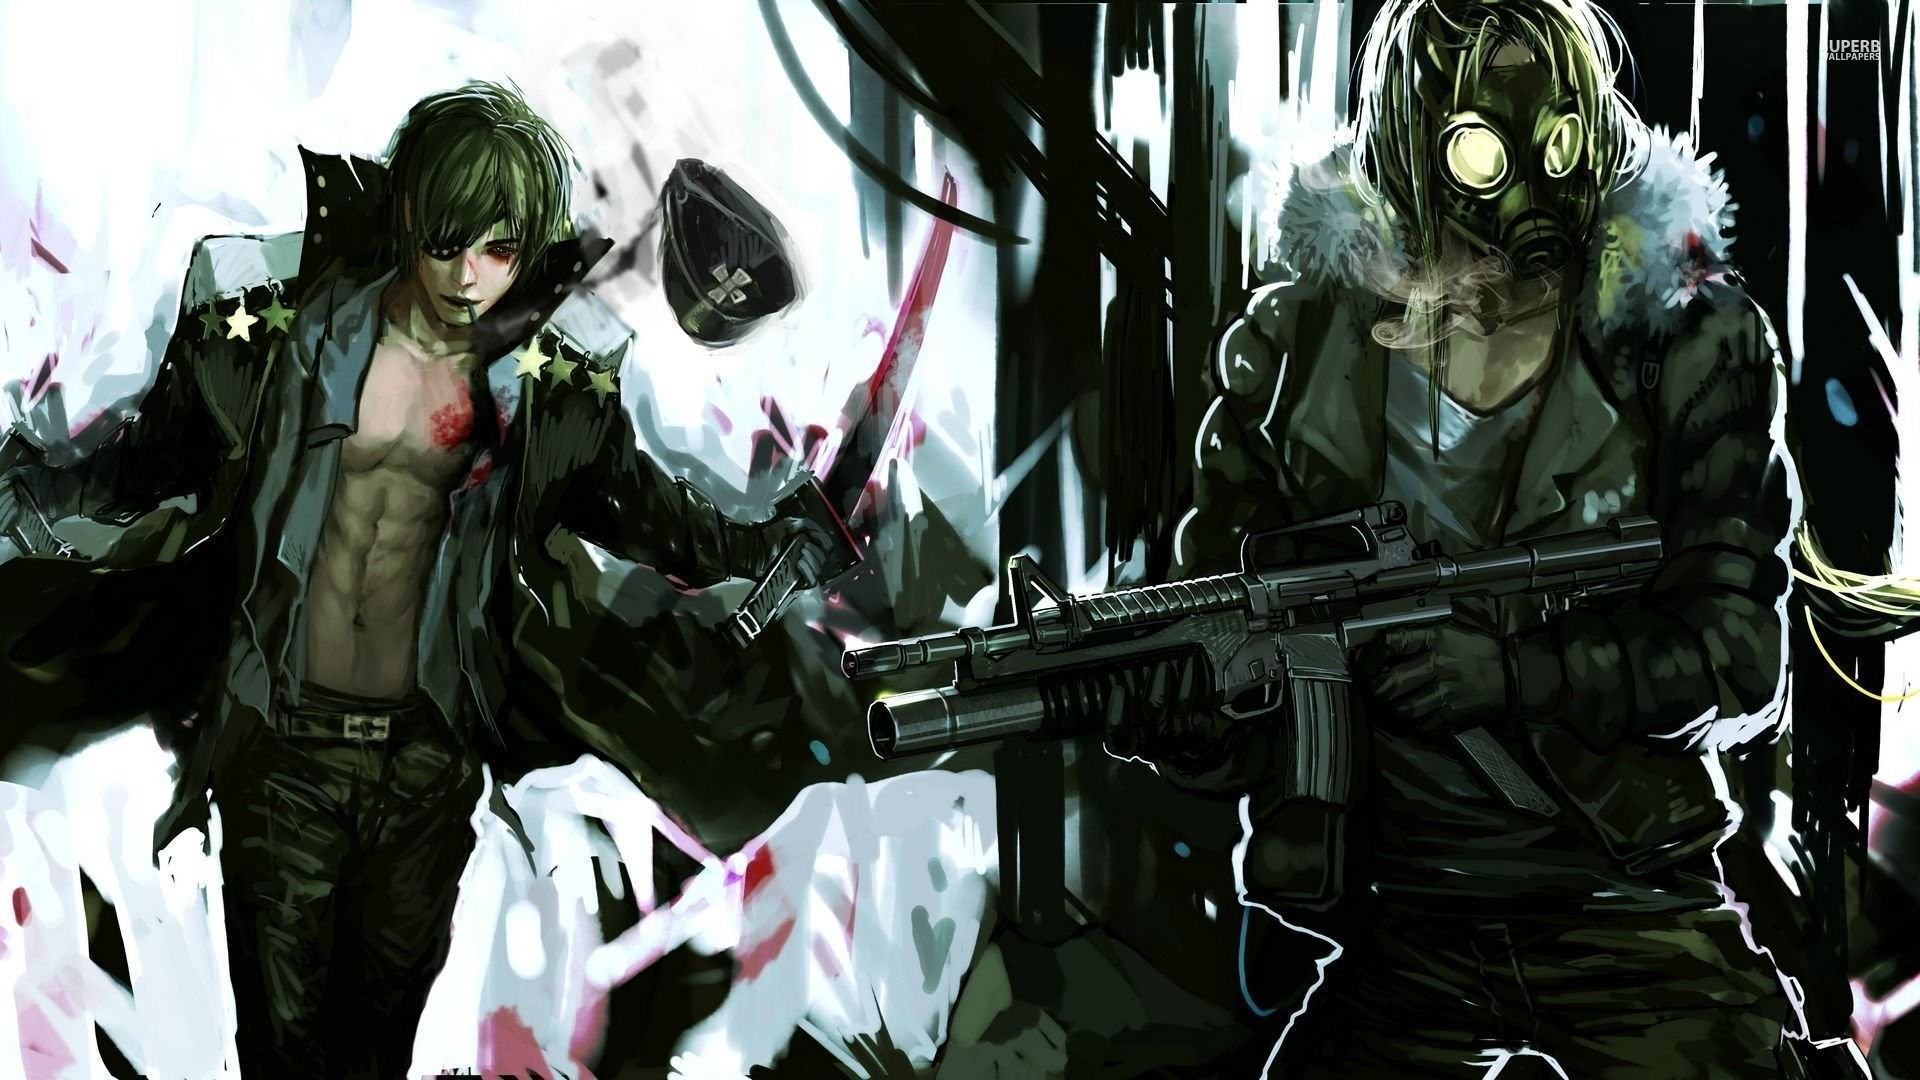 anarchist anime guys